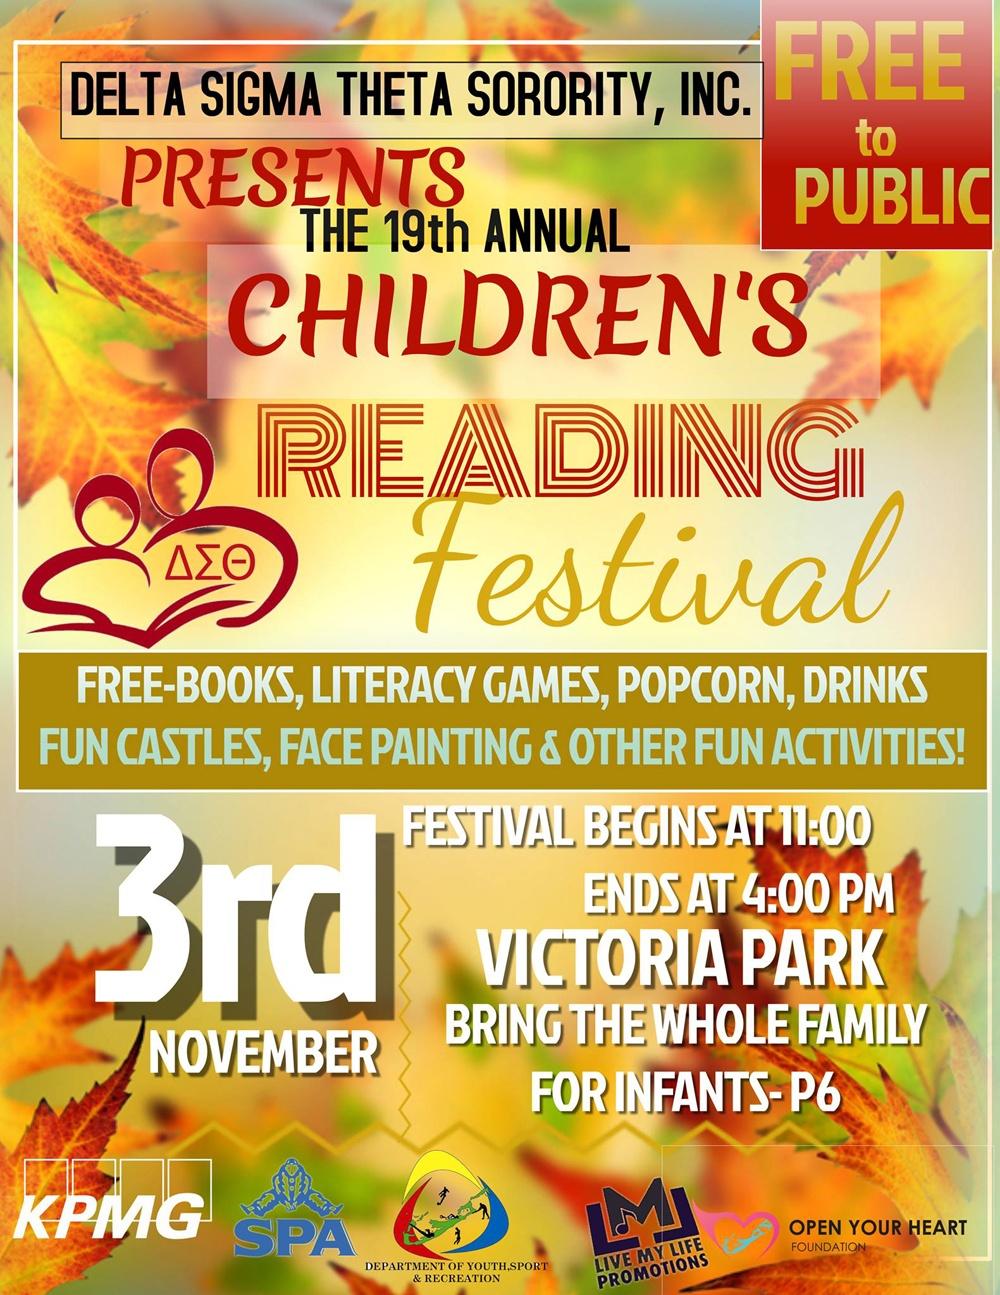 Children's Reading Festival Bermuda Oct 23 2018